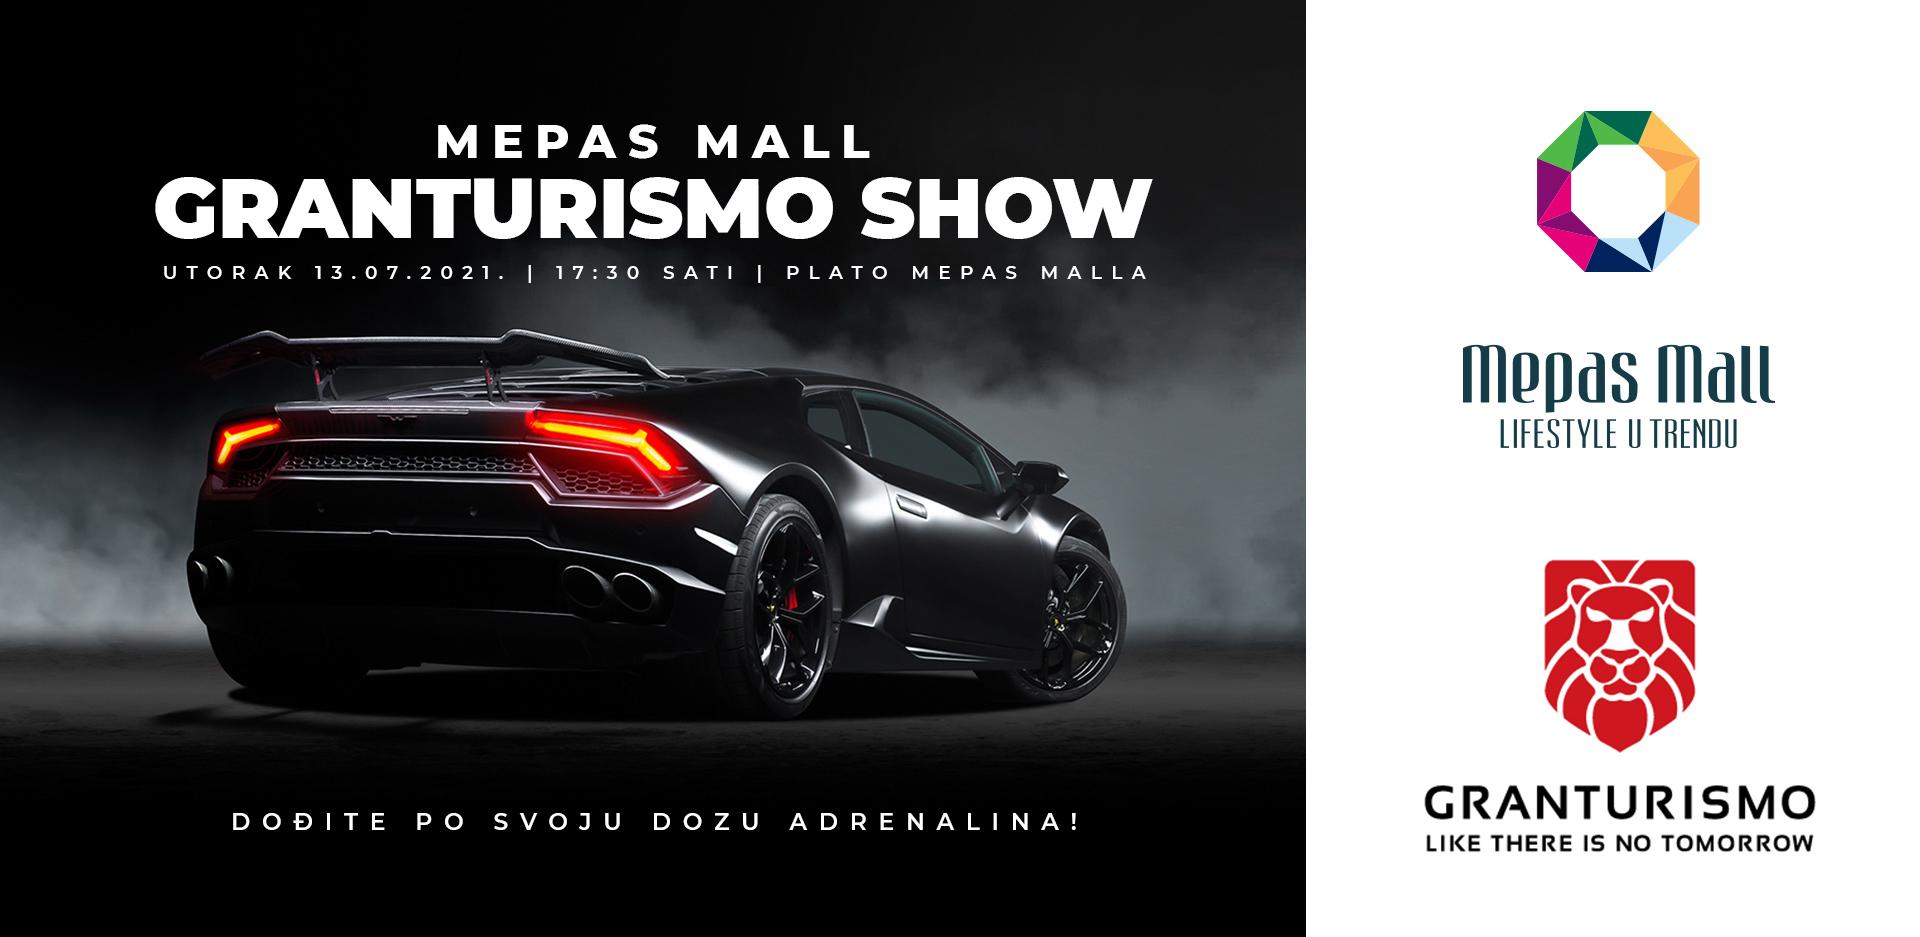 Mepas Mall Granturismo Show 2021